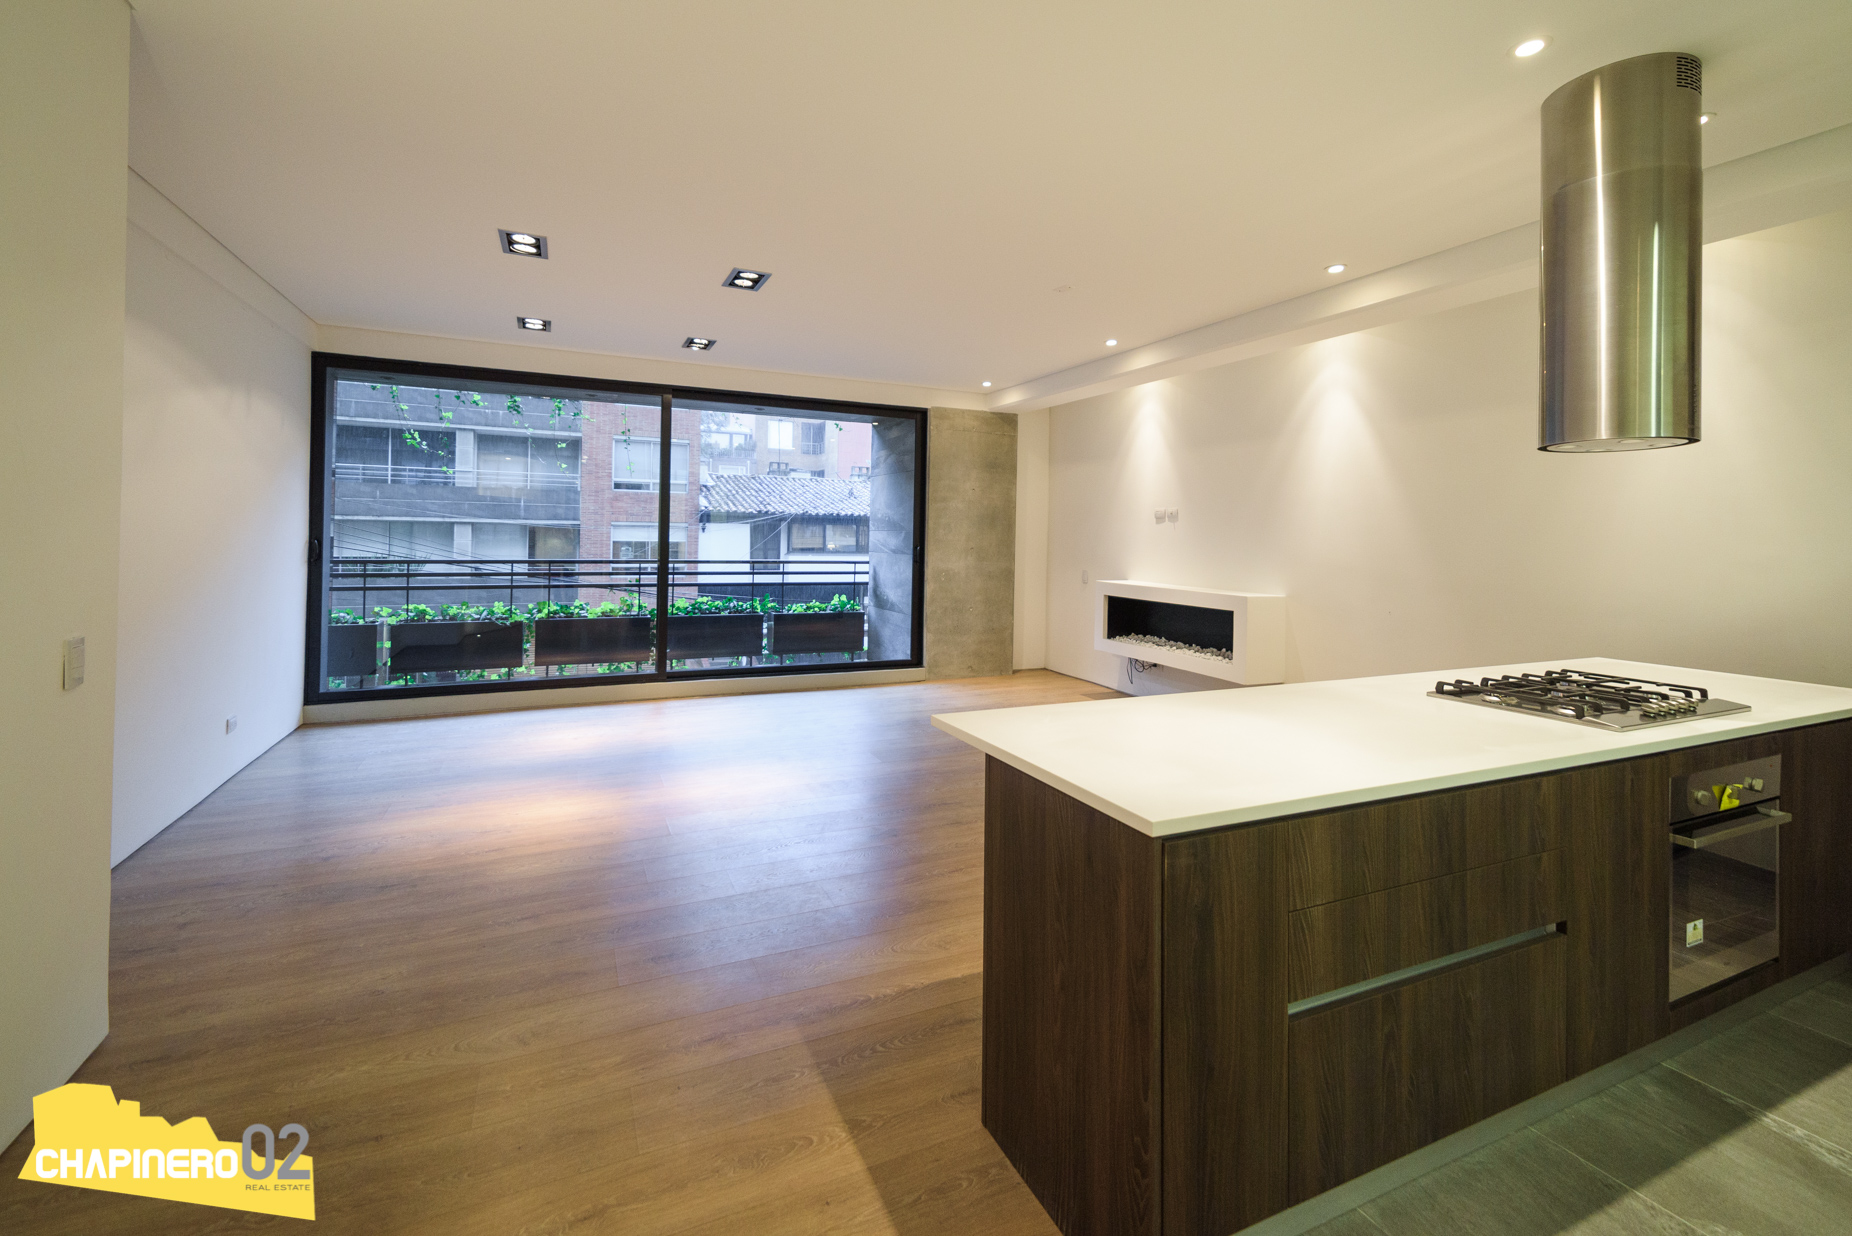 Apto Venta :: 143 m² :: Chicó Reservado :: $1.150M